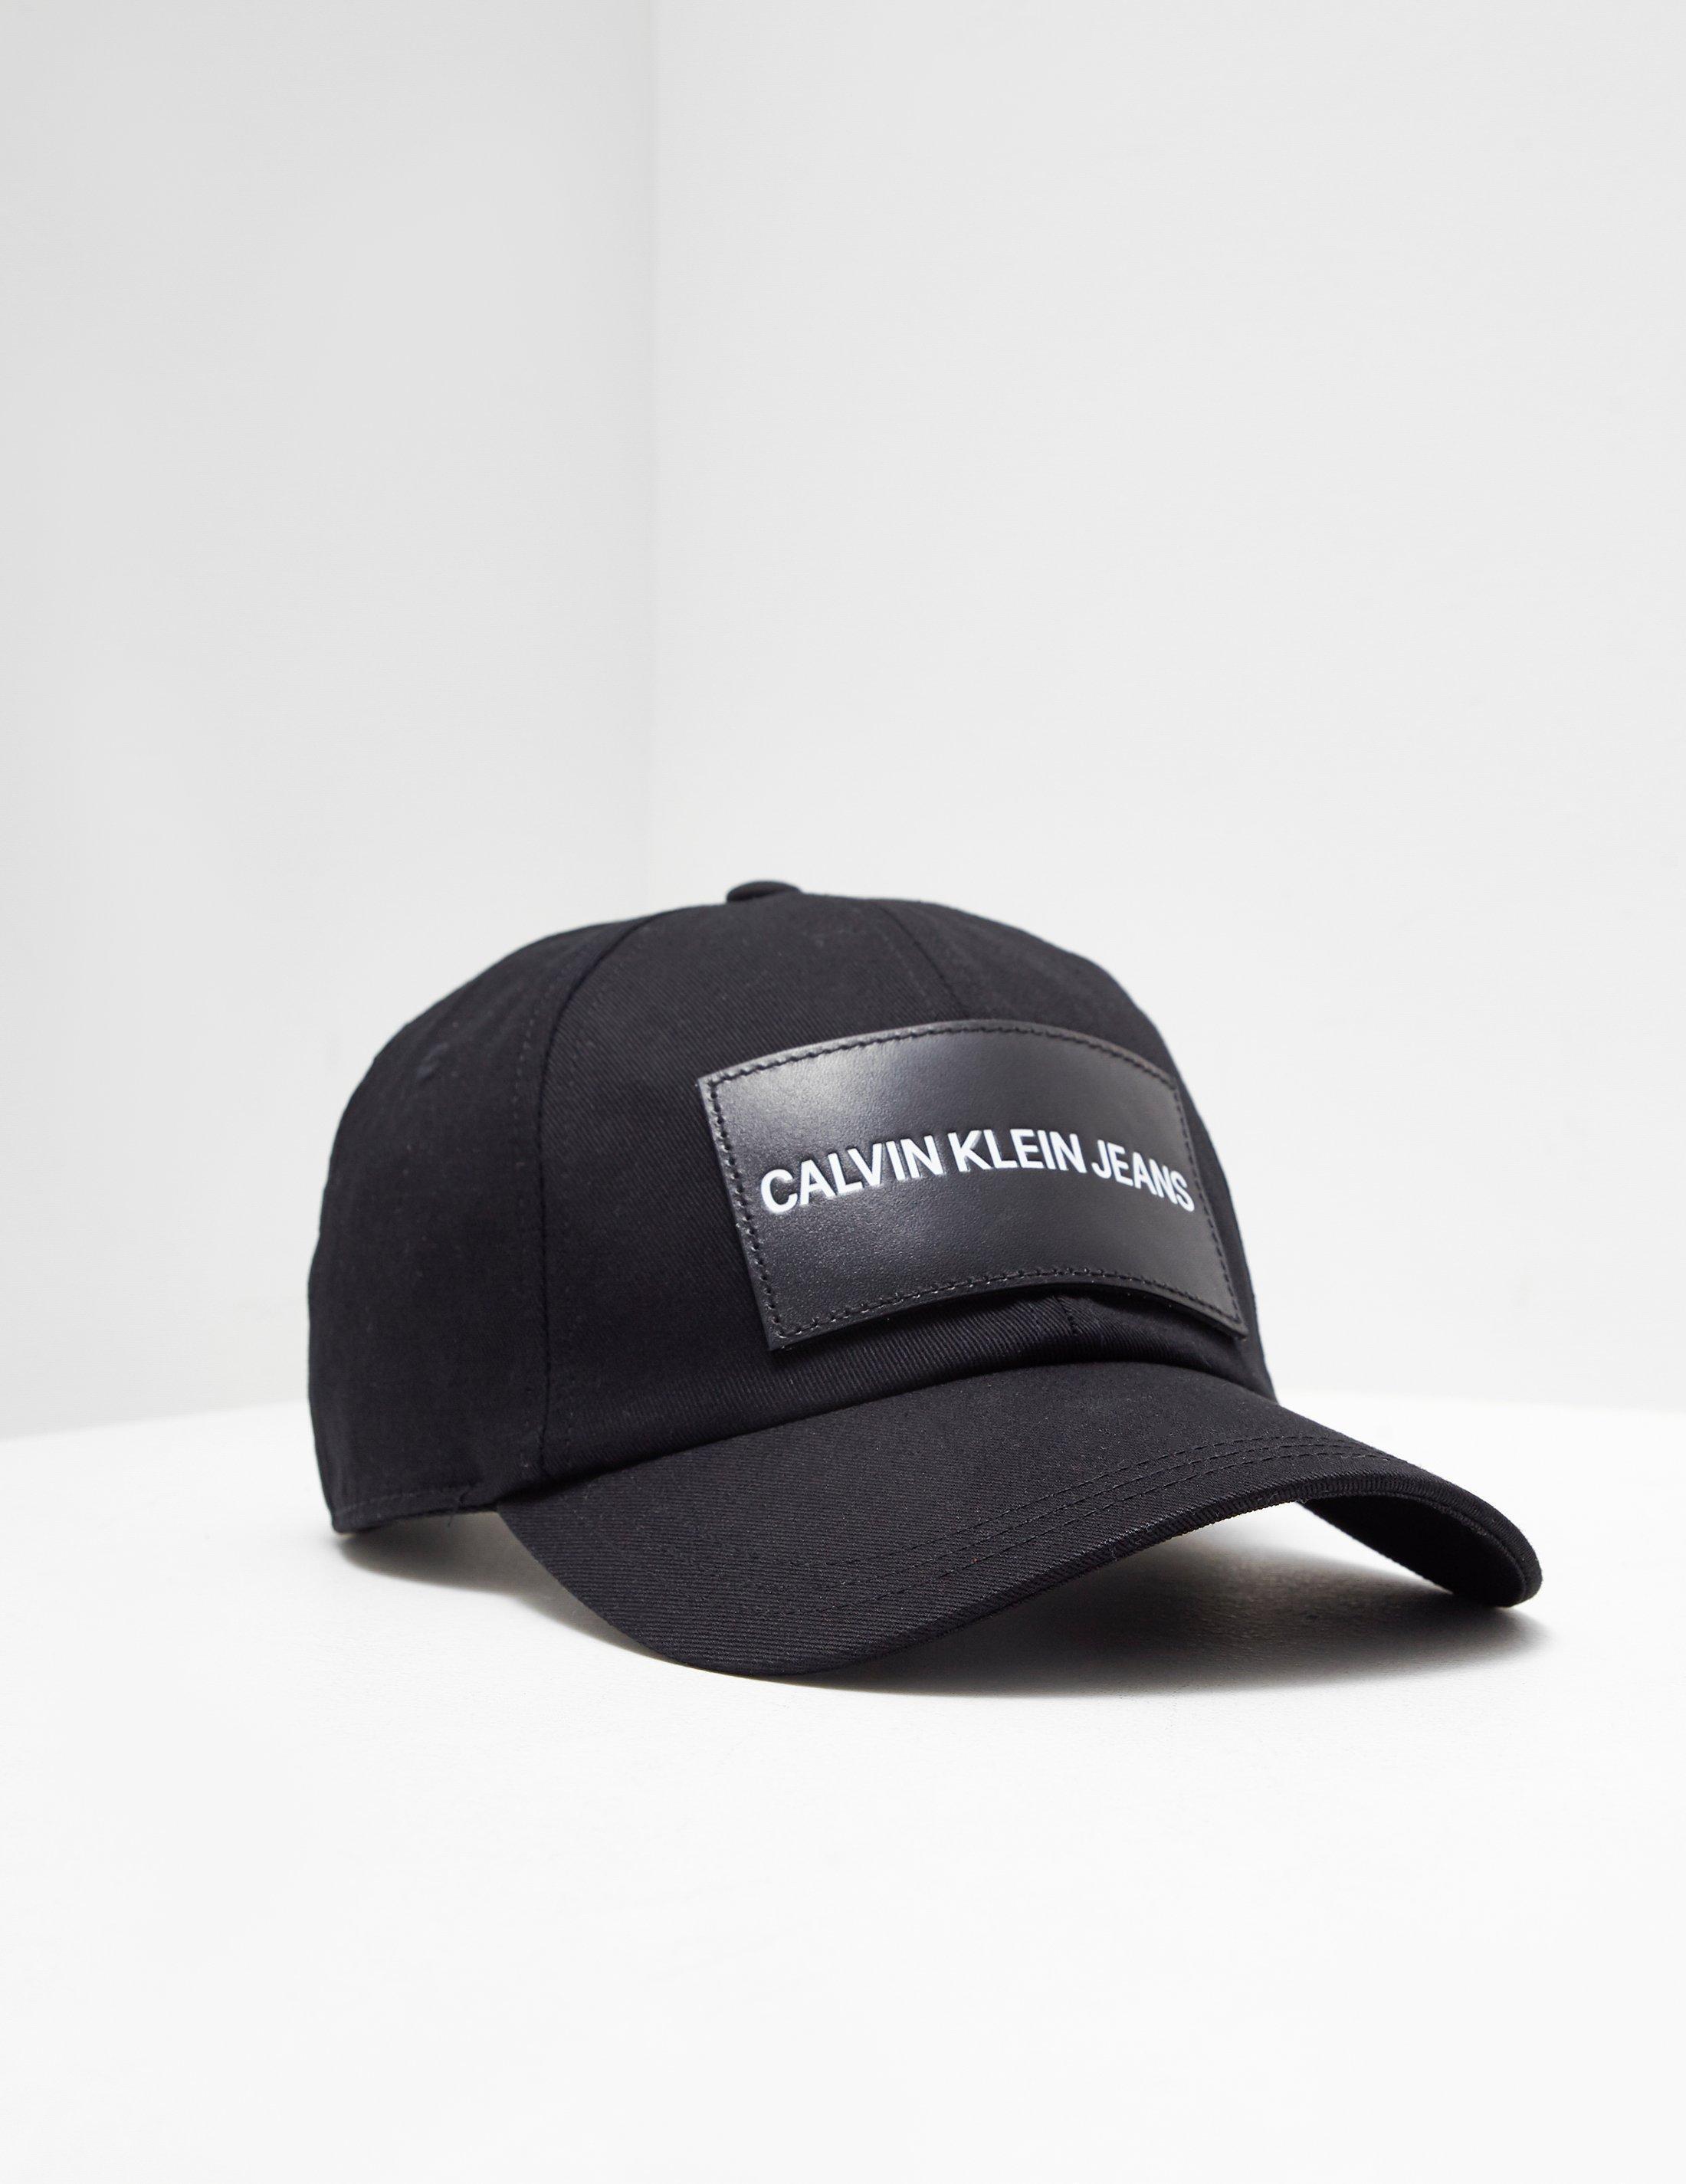 282cb4be5c4 Lyst - Calvin Klein Patch Logo Cap Black in Black for Men - Save 50%